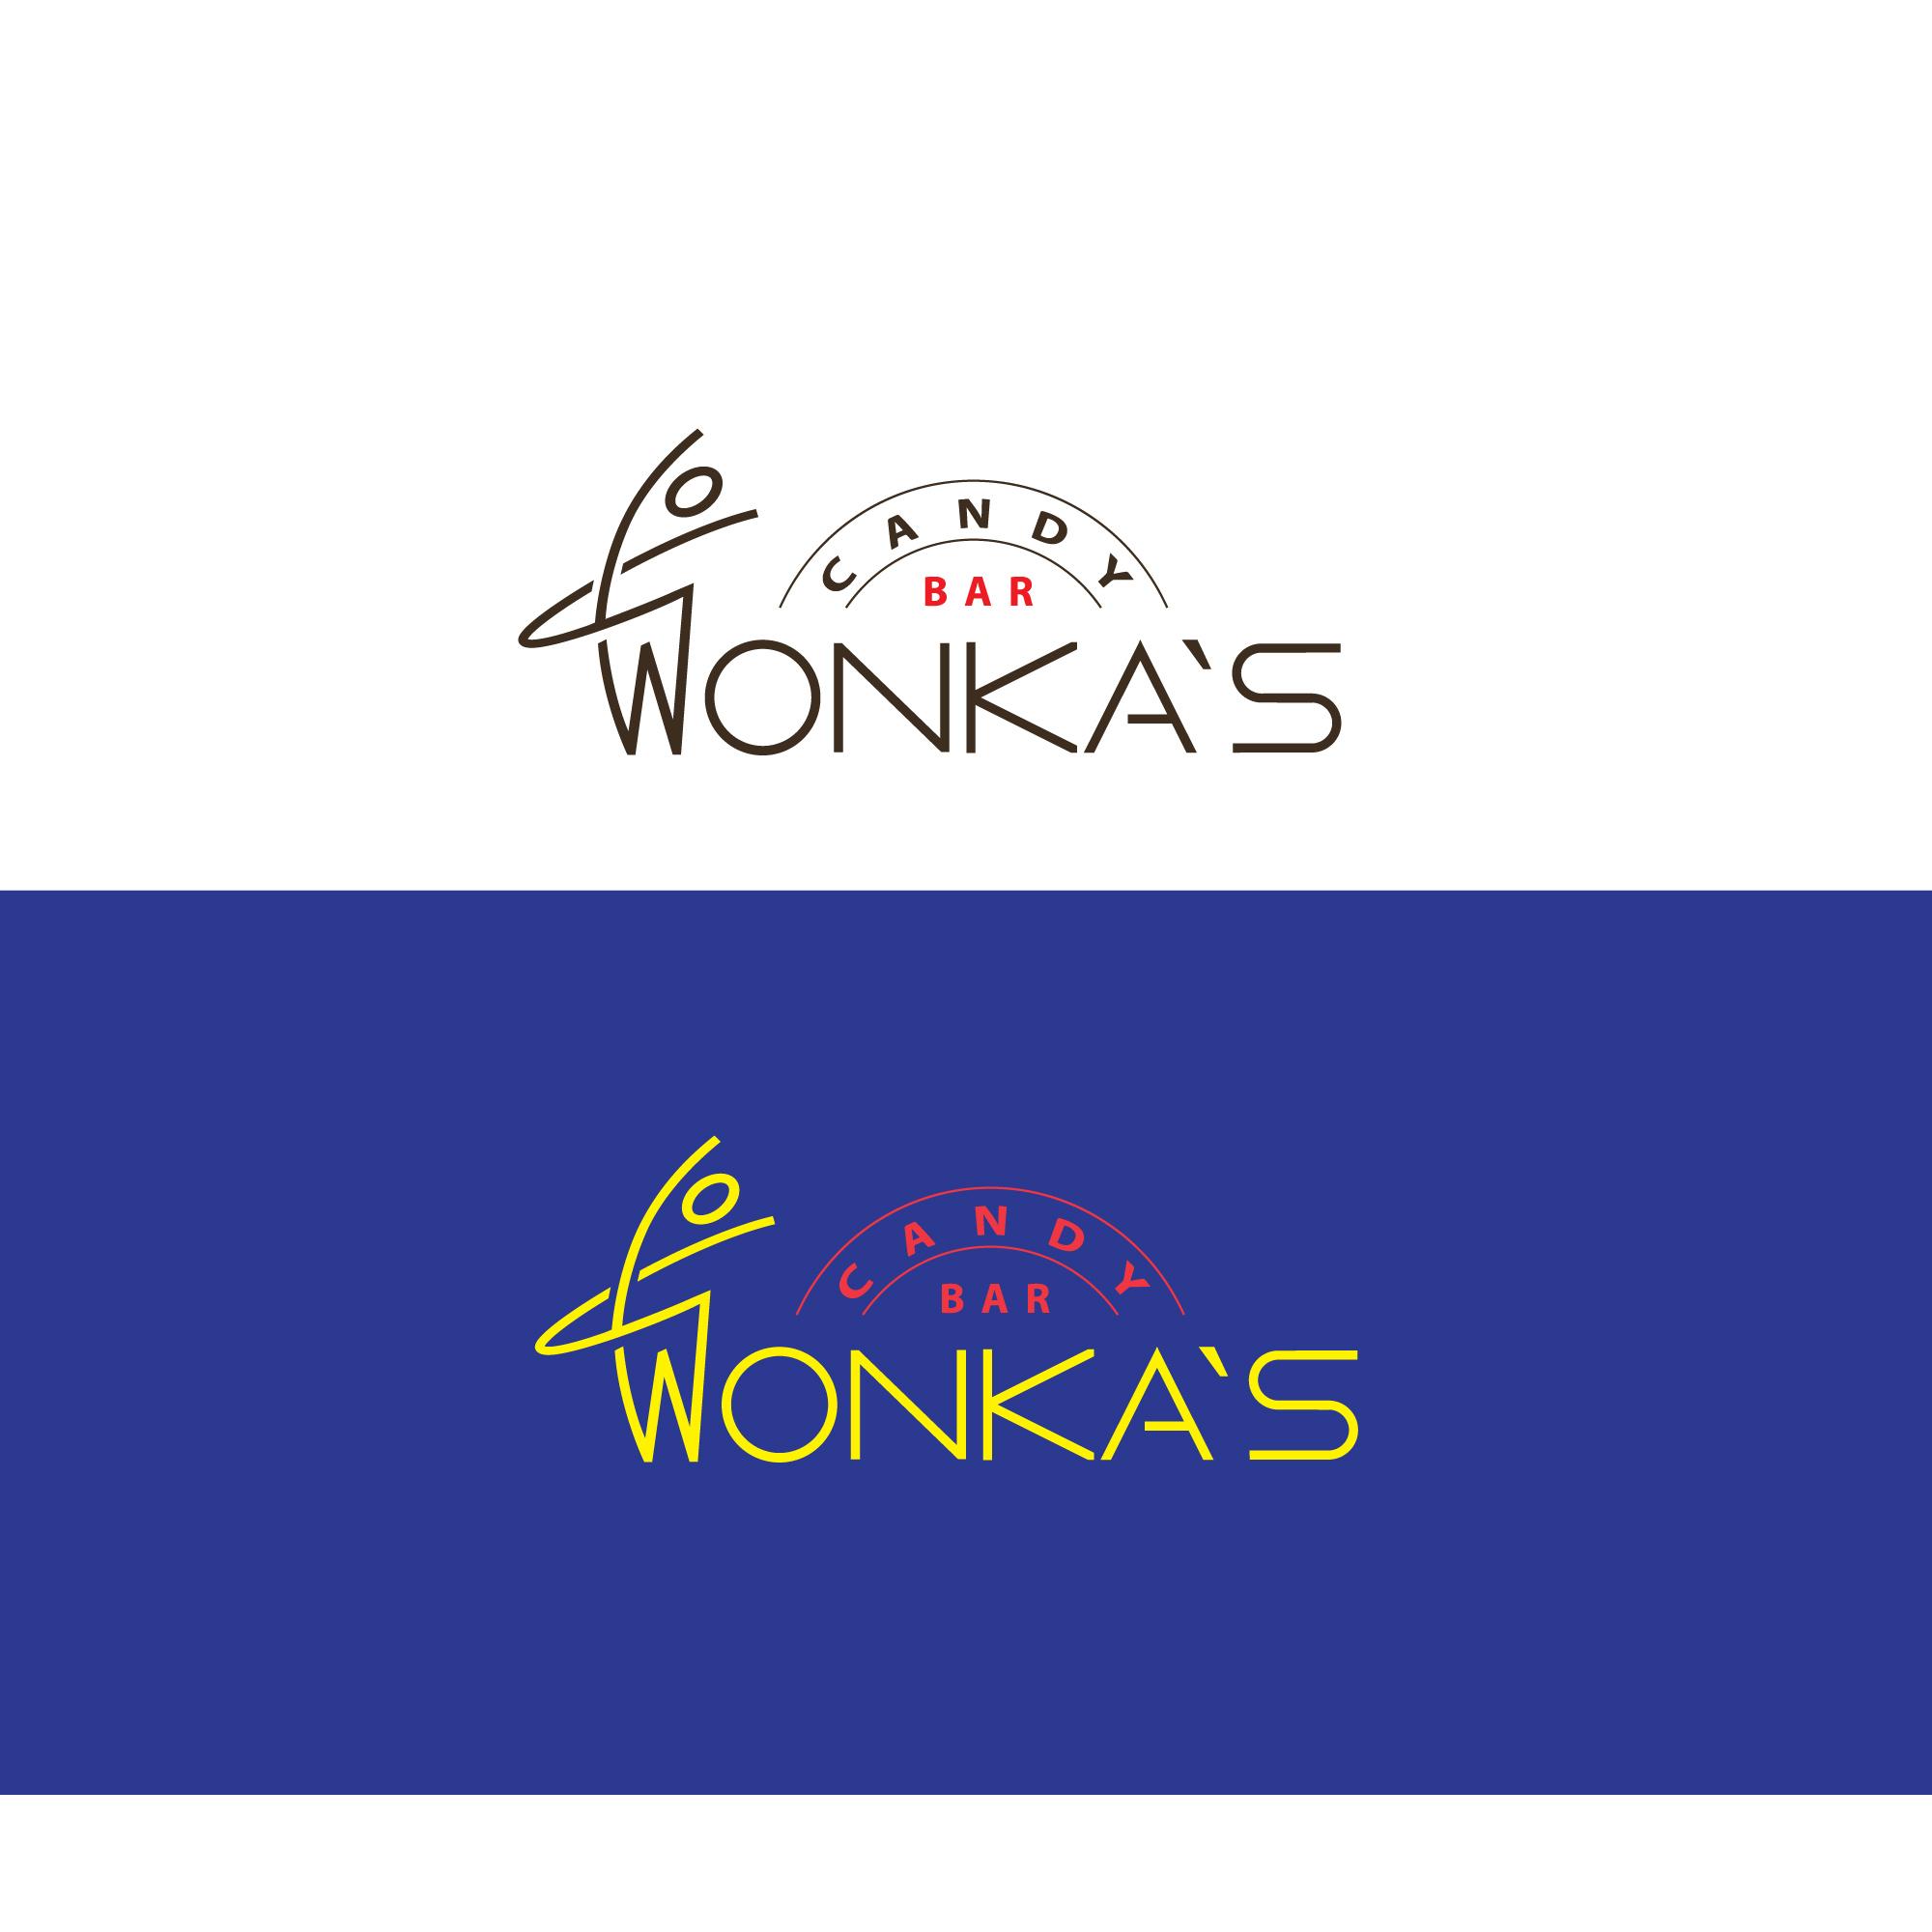 Разработка логотипа магазина сладостей со всего мира. фото f_7795a298936aa271.jpg